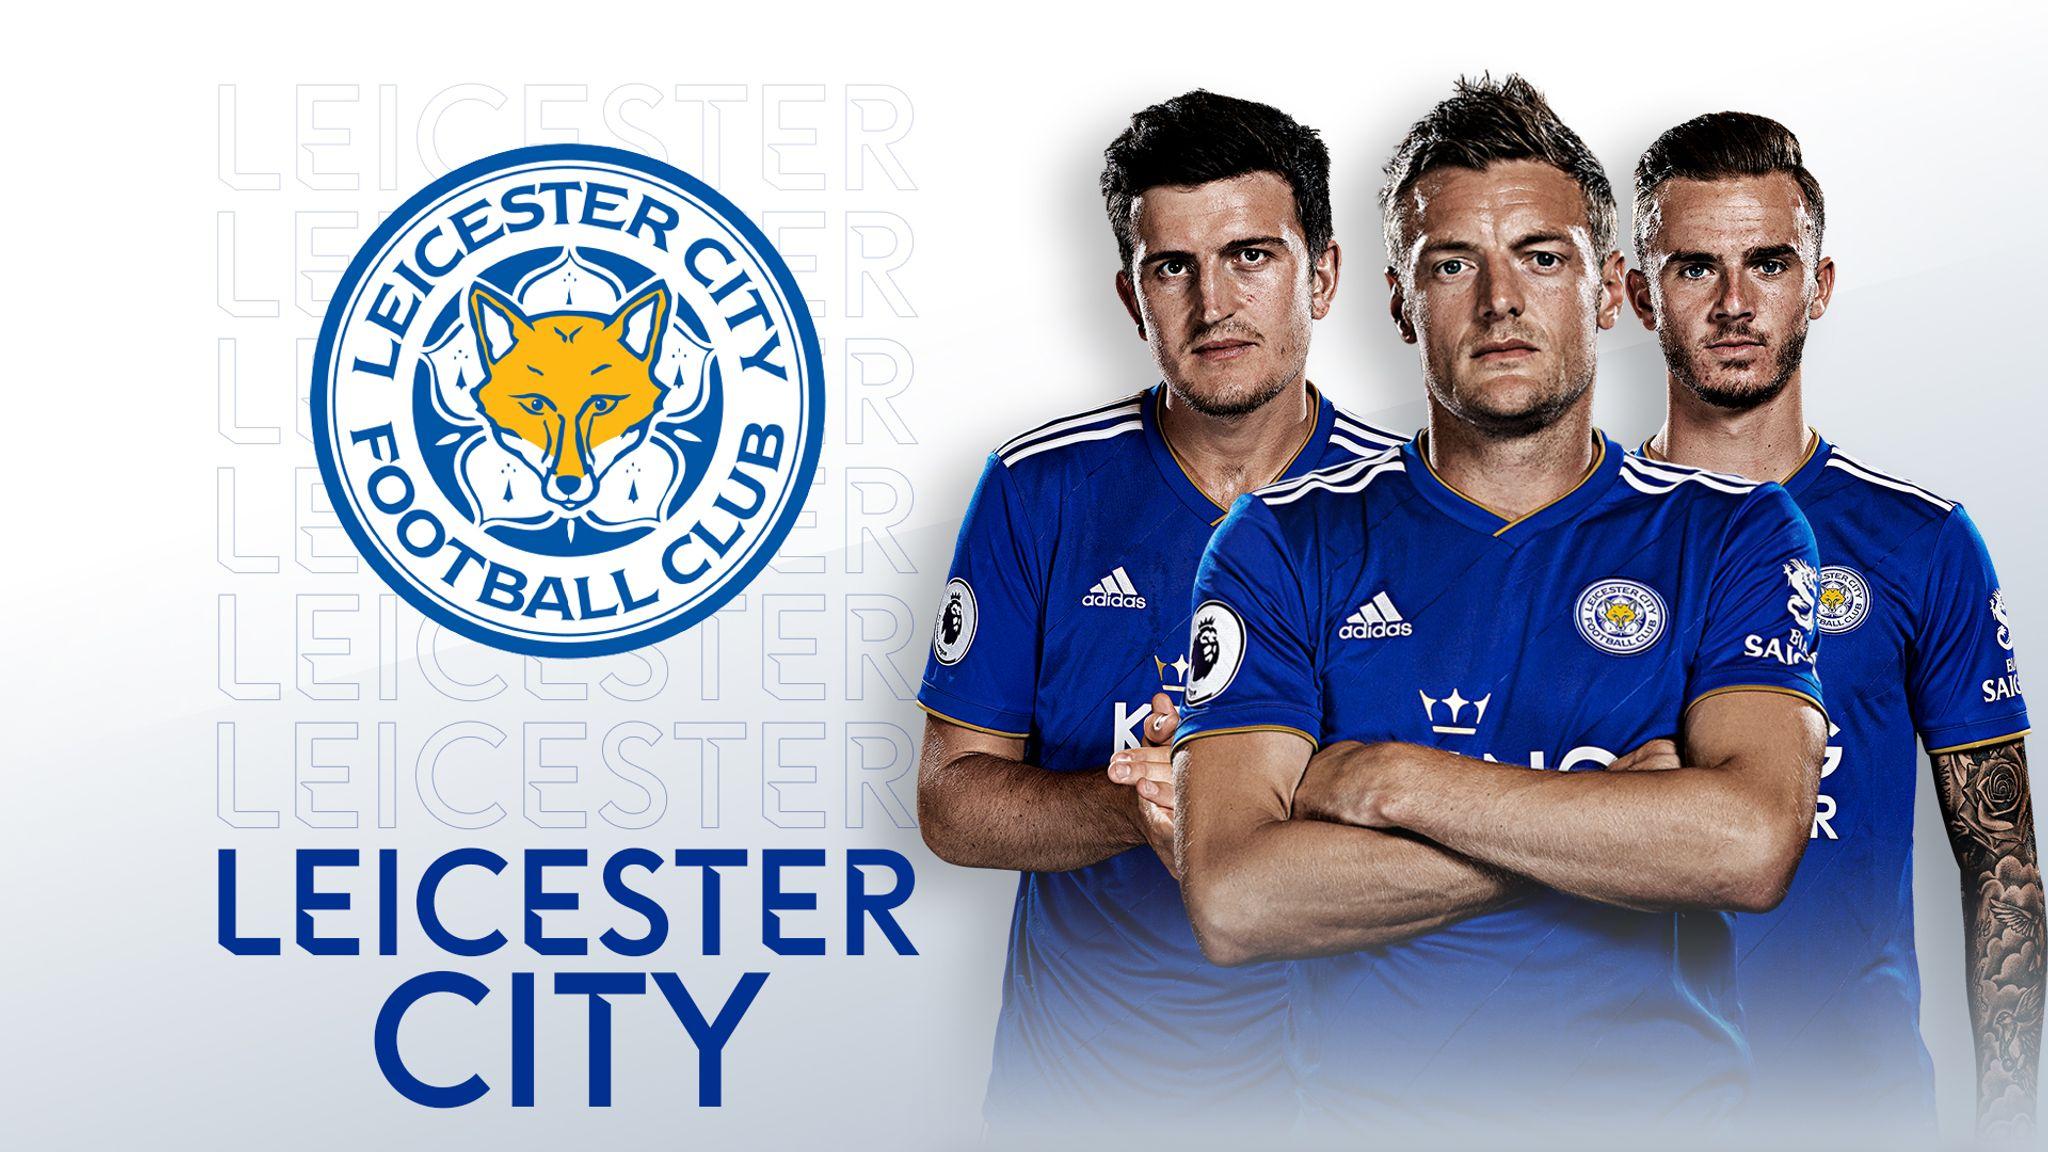 Leicester City Fixtures Premier League 2019 20 Football News Sky Sports